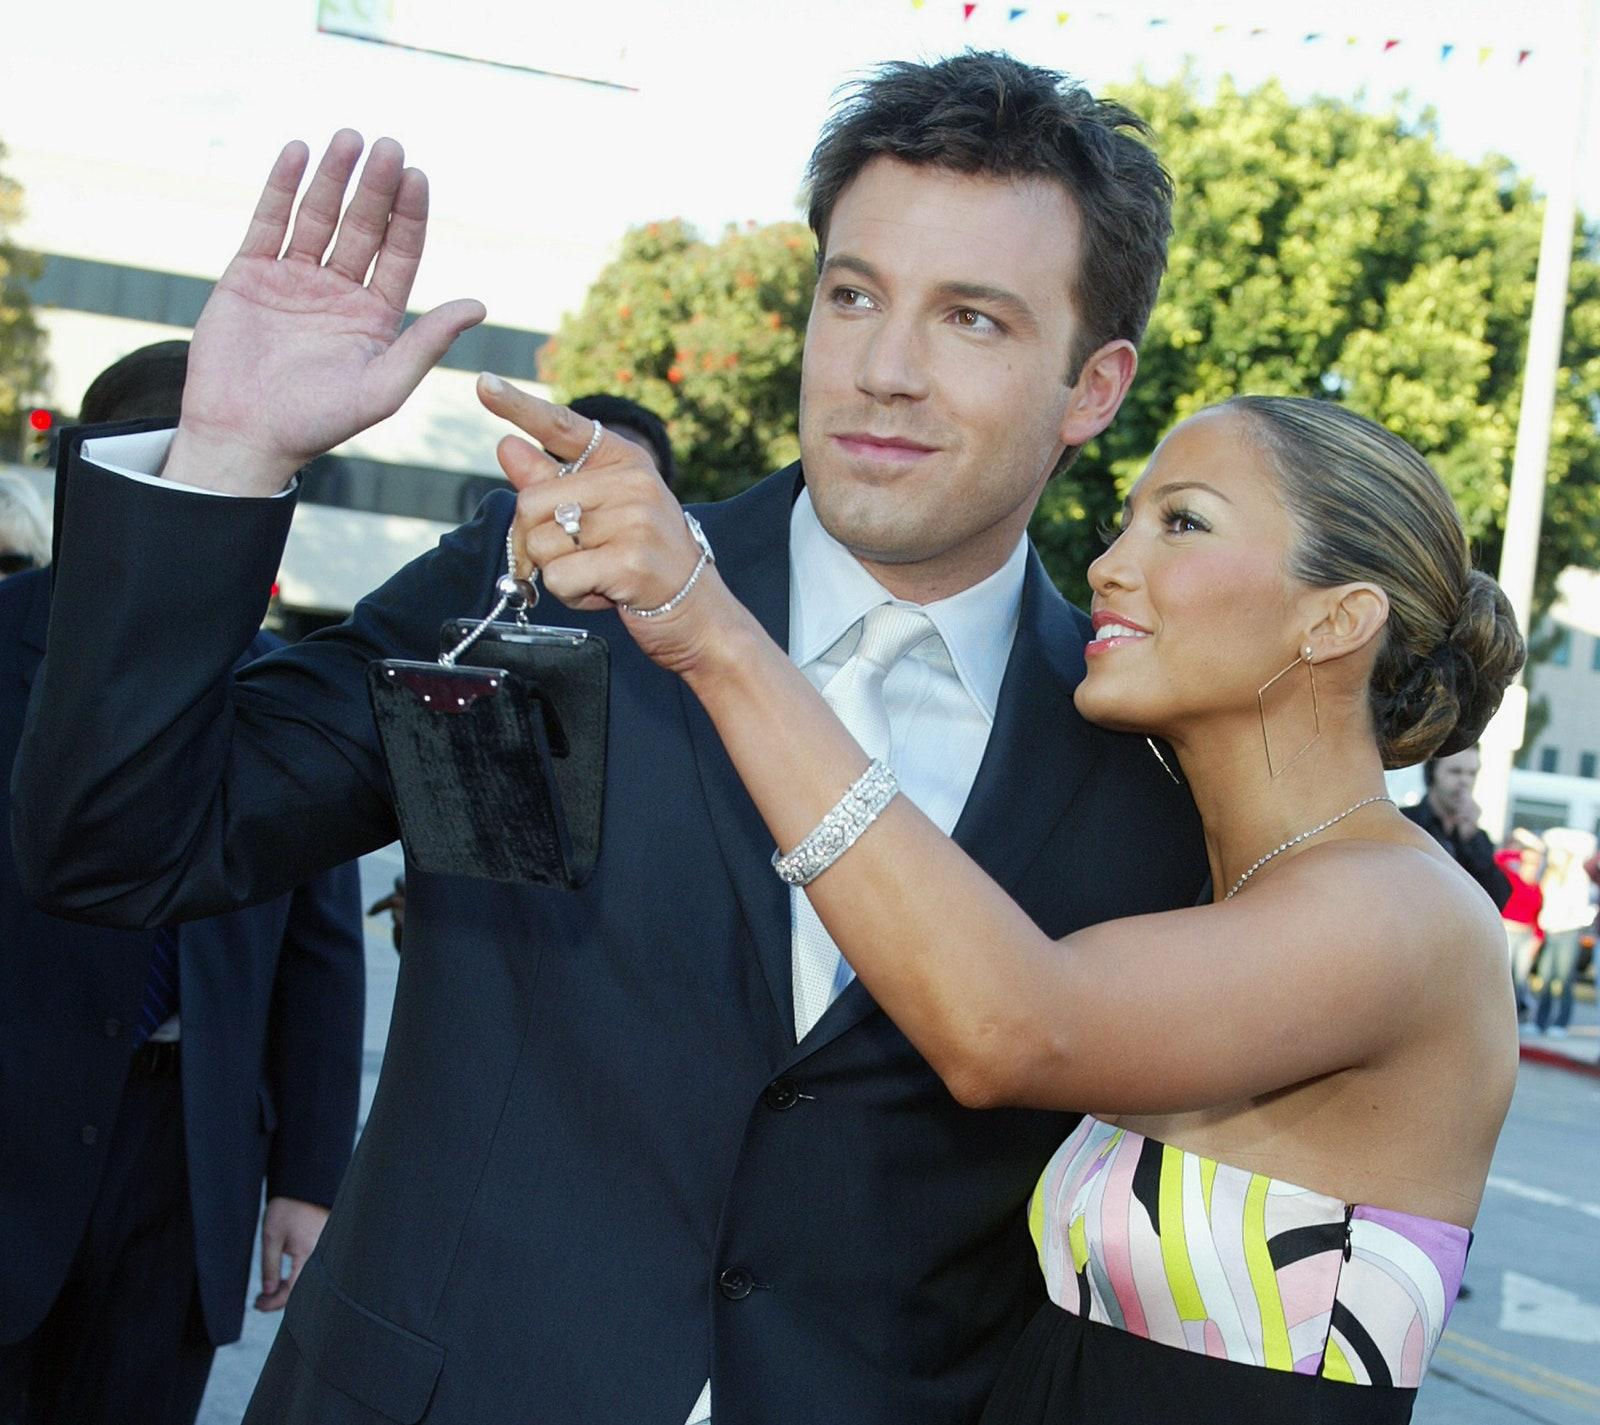 Ben Affleck has only words of praise for his former fiancée Jennifer Lopez